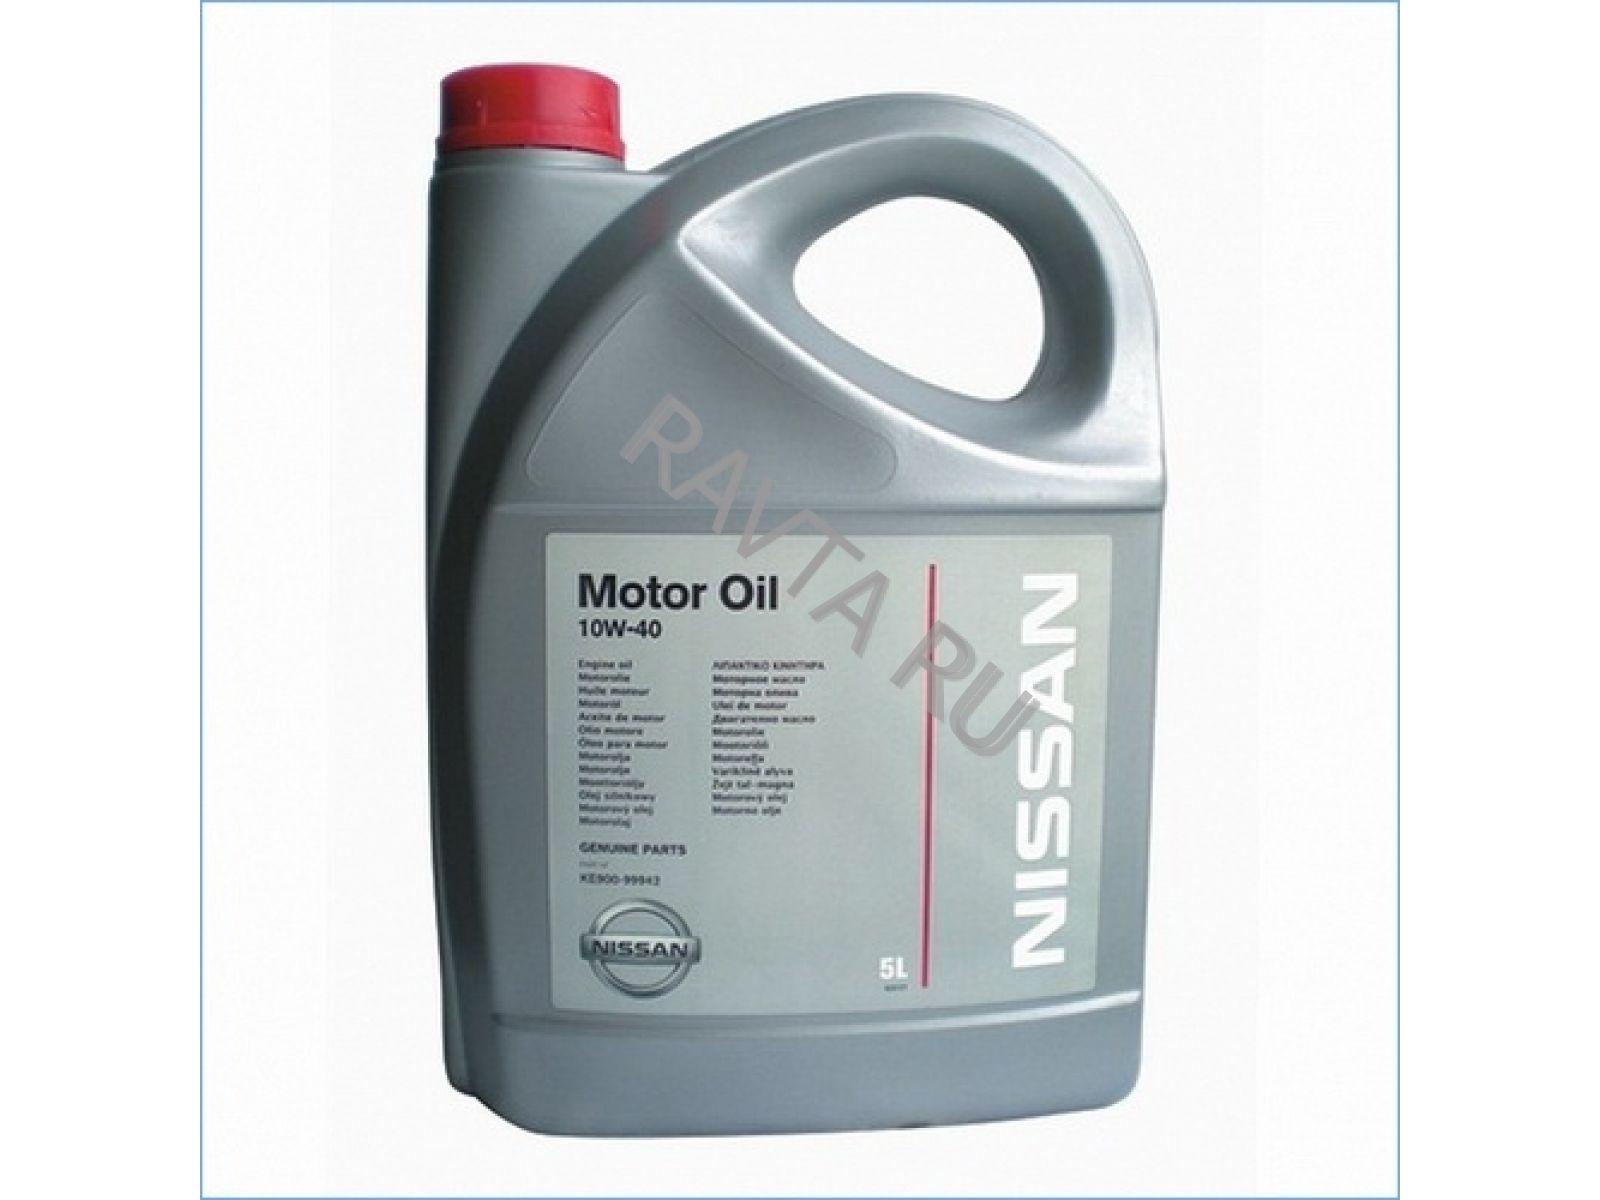 Масло Nissan Motor Oil 10W 40 (EU) (5л) от Ravta